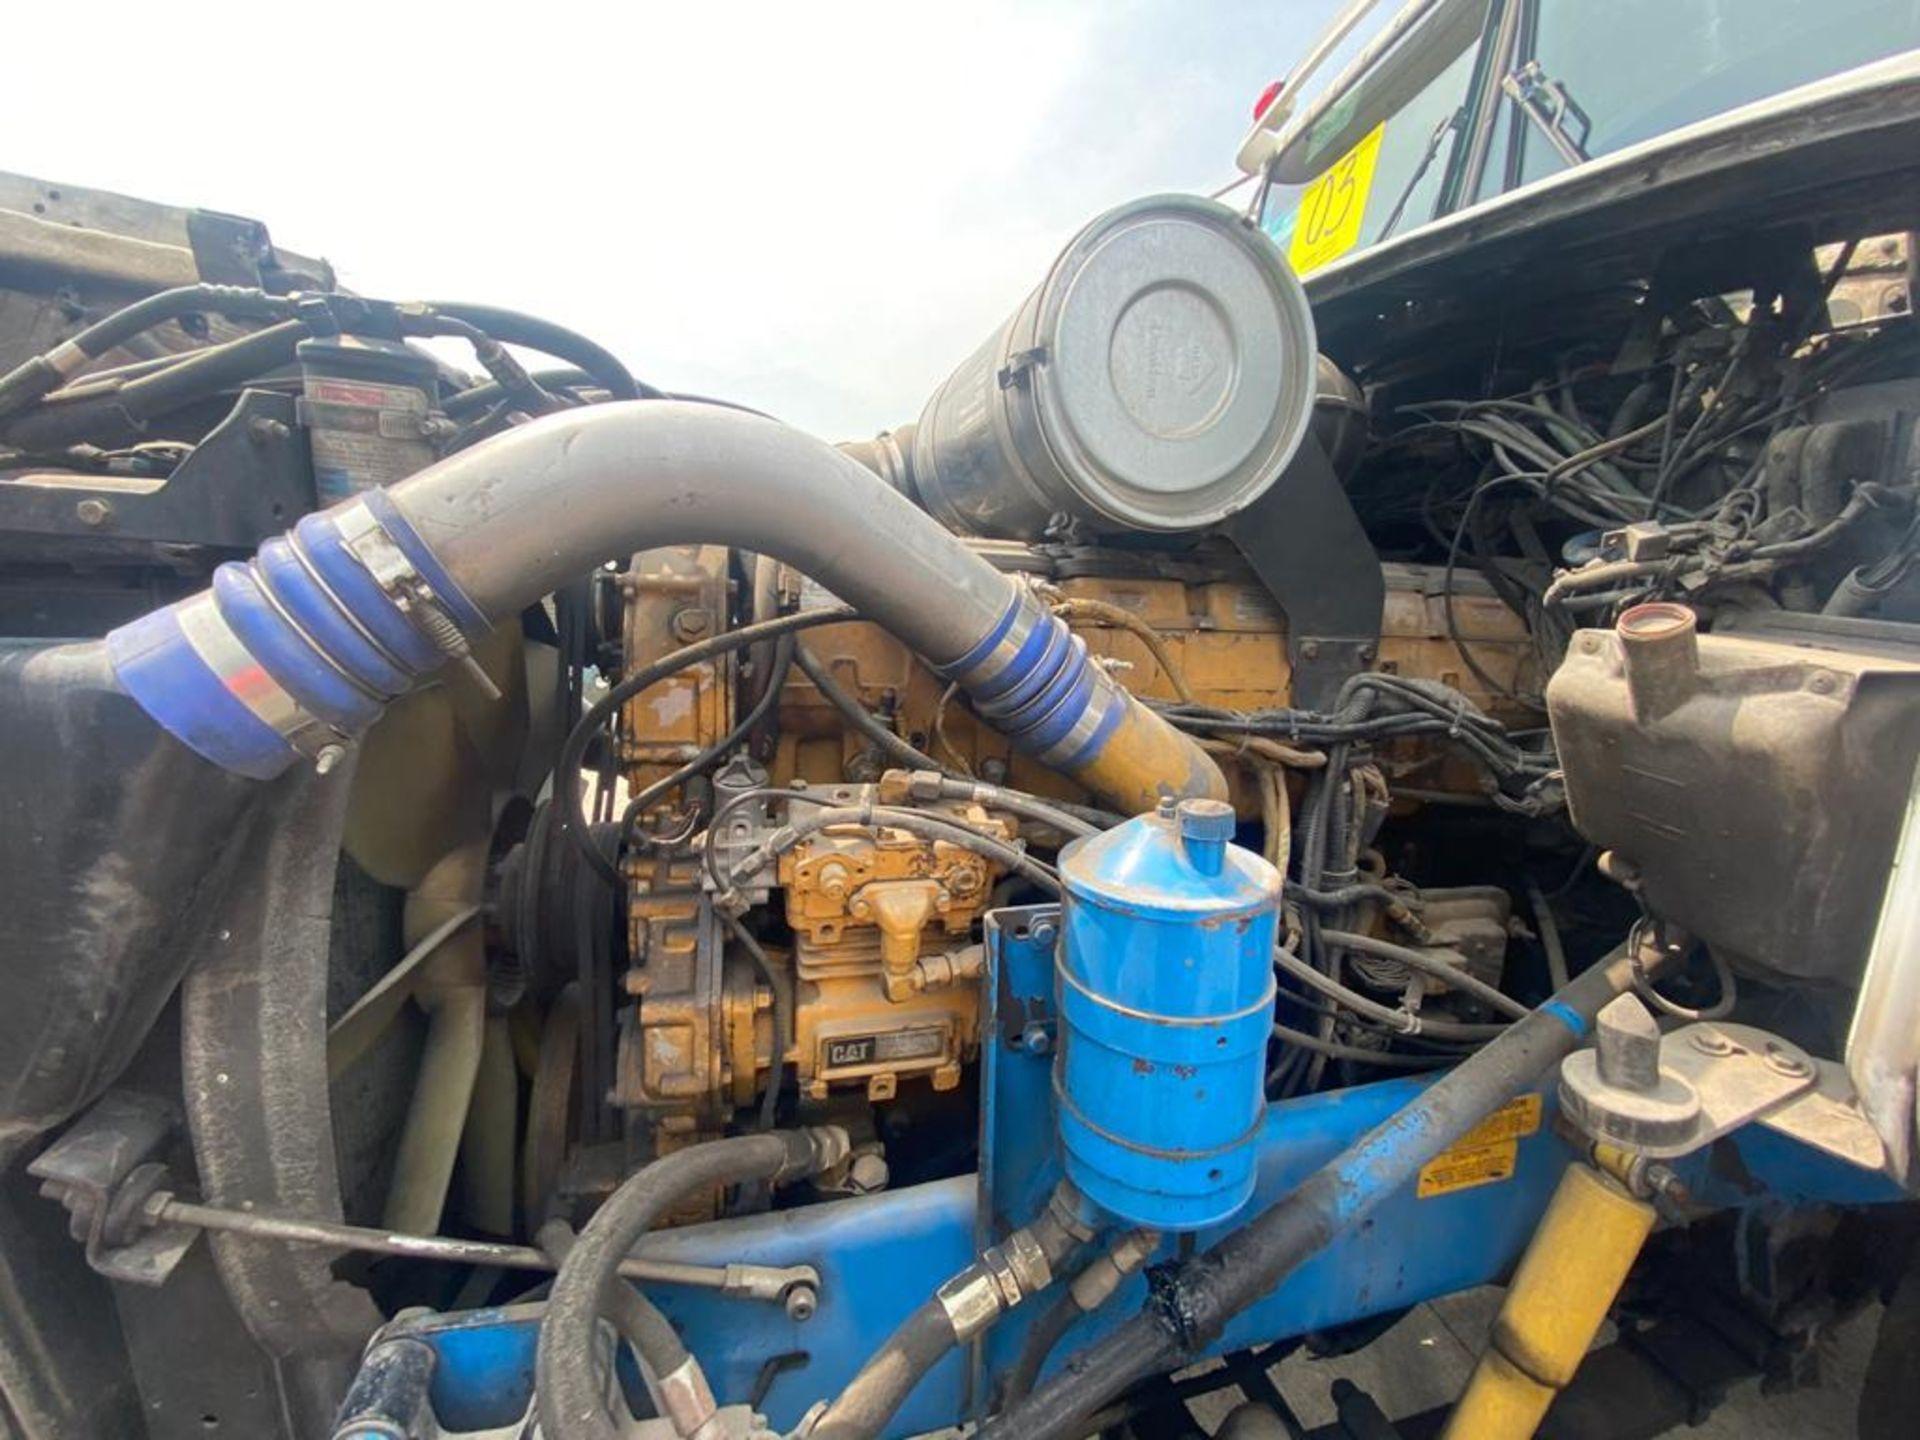 1999 Kenworth Sleeper truck tractor, standard transmission of 18 speeds - Image 54 of 62